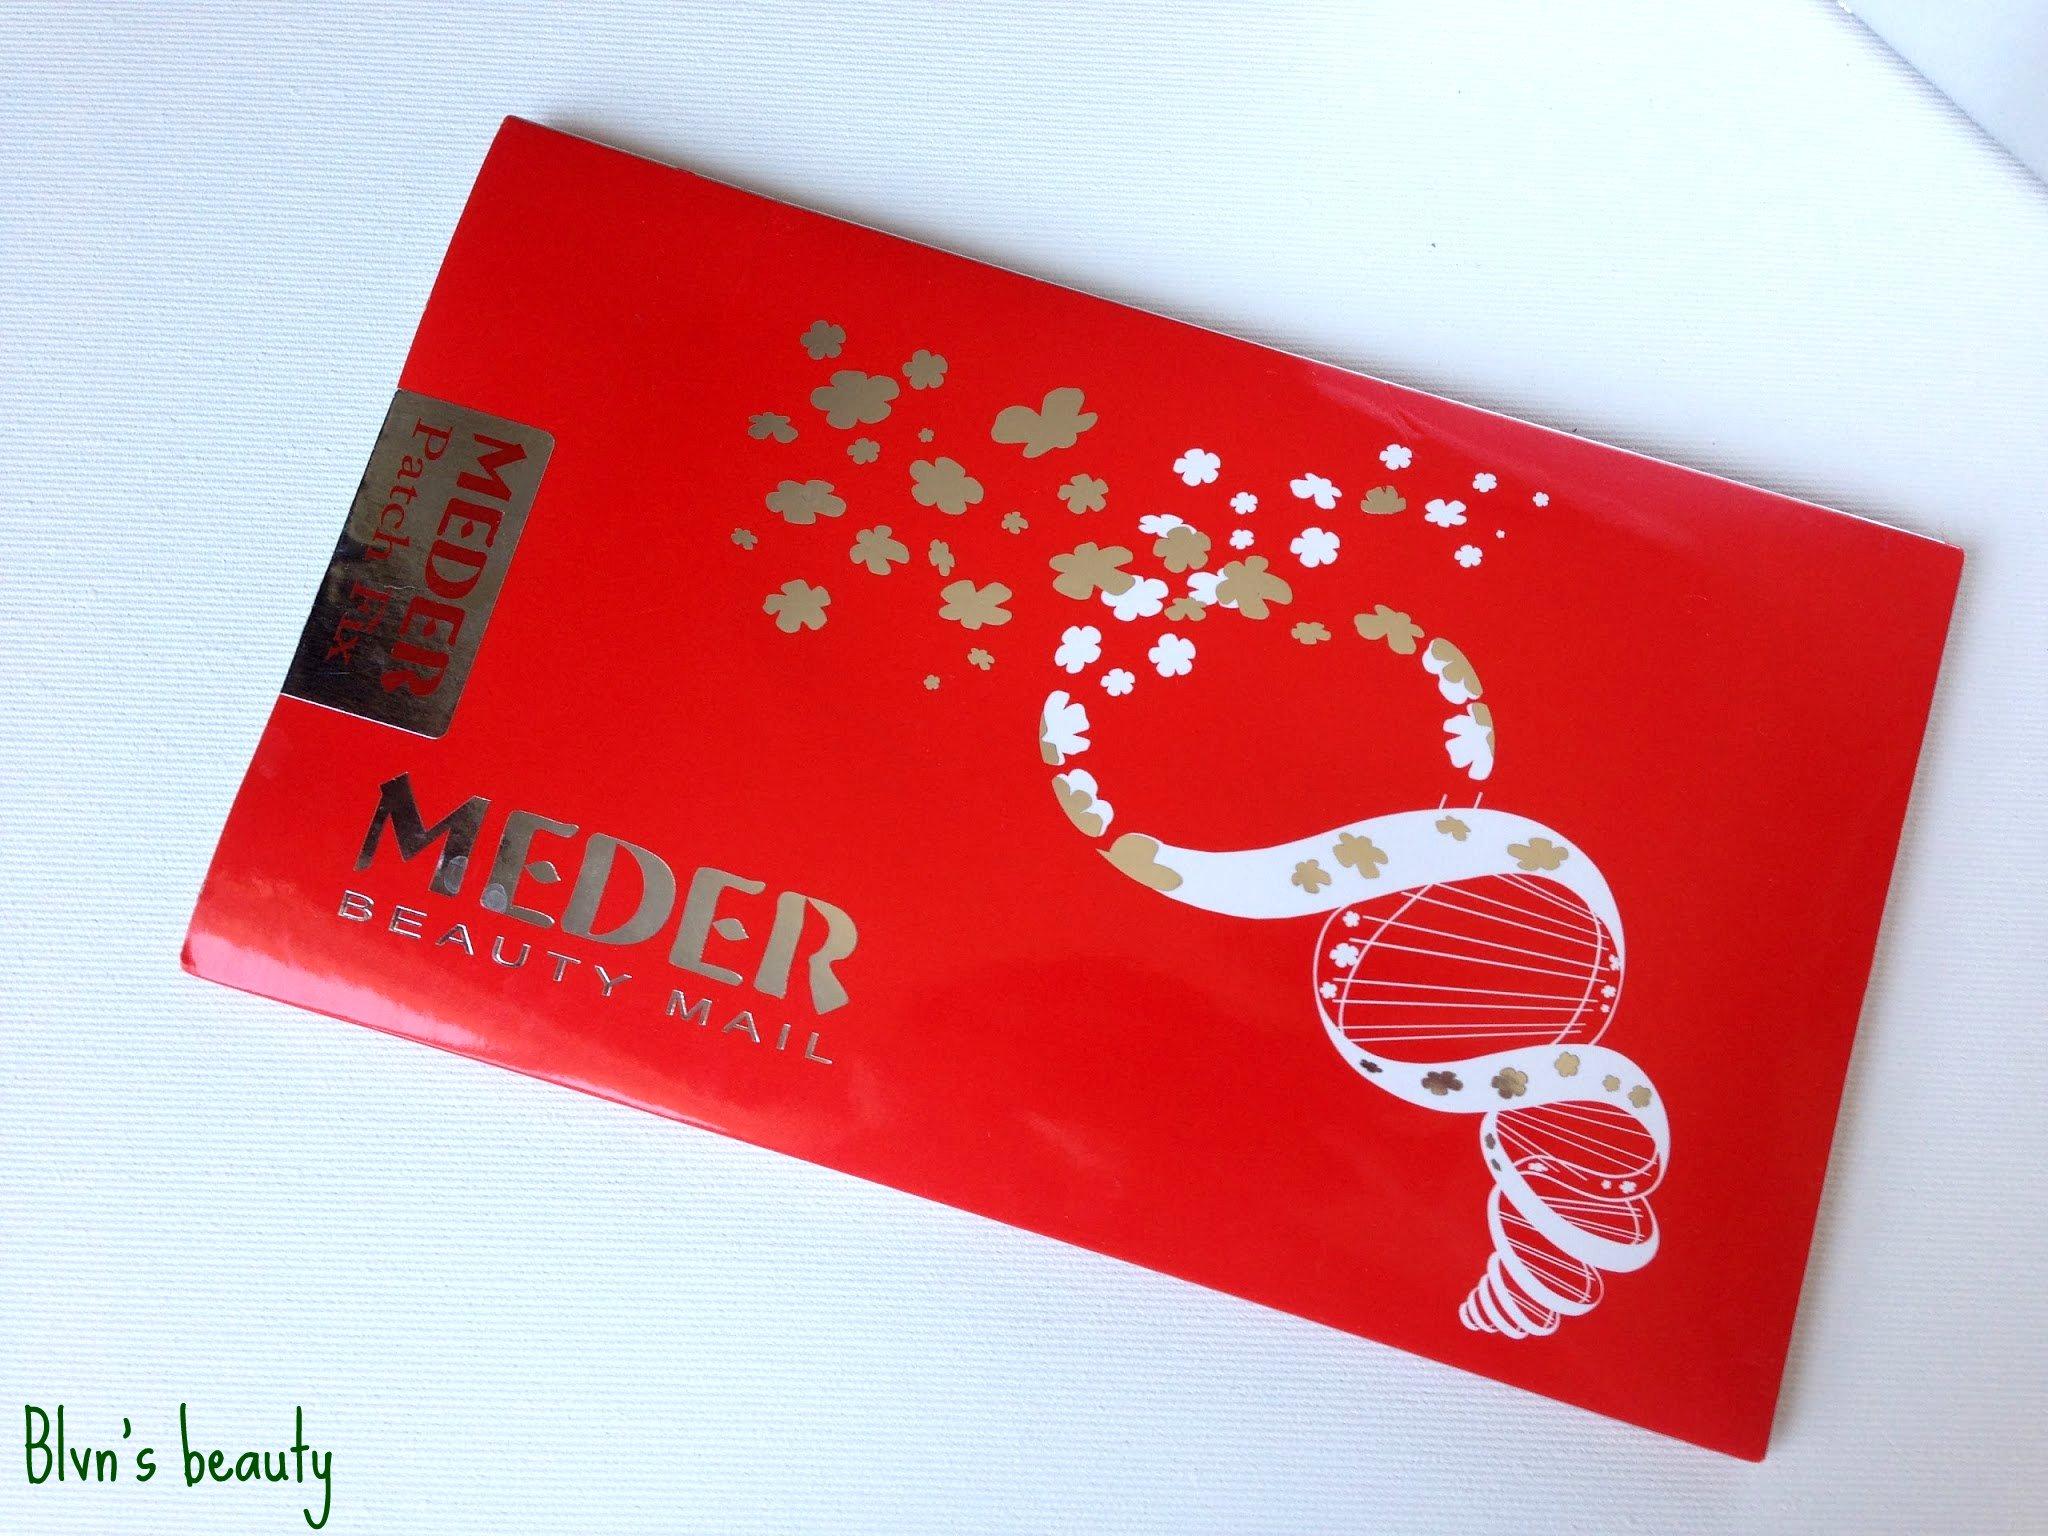 Meder Patch Fix / Beauty Mail